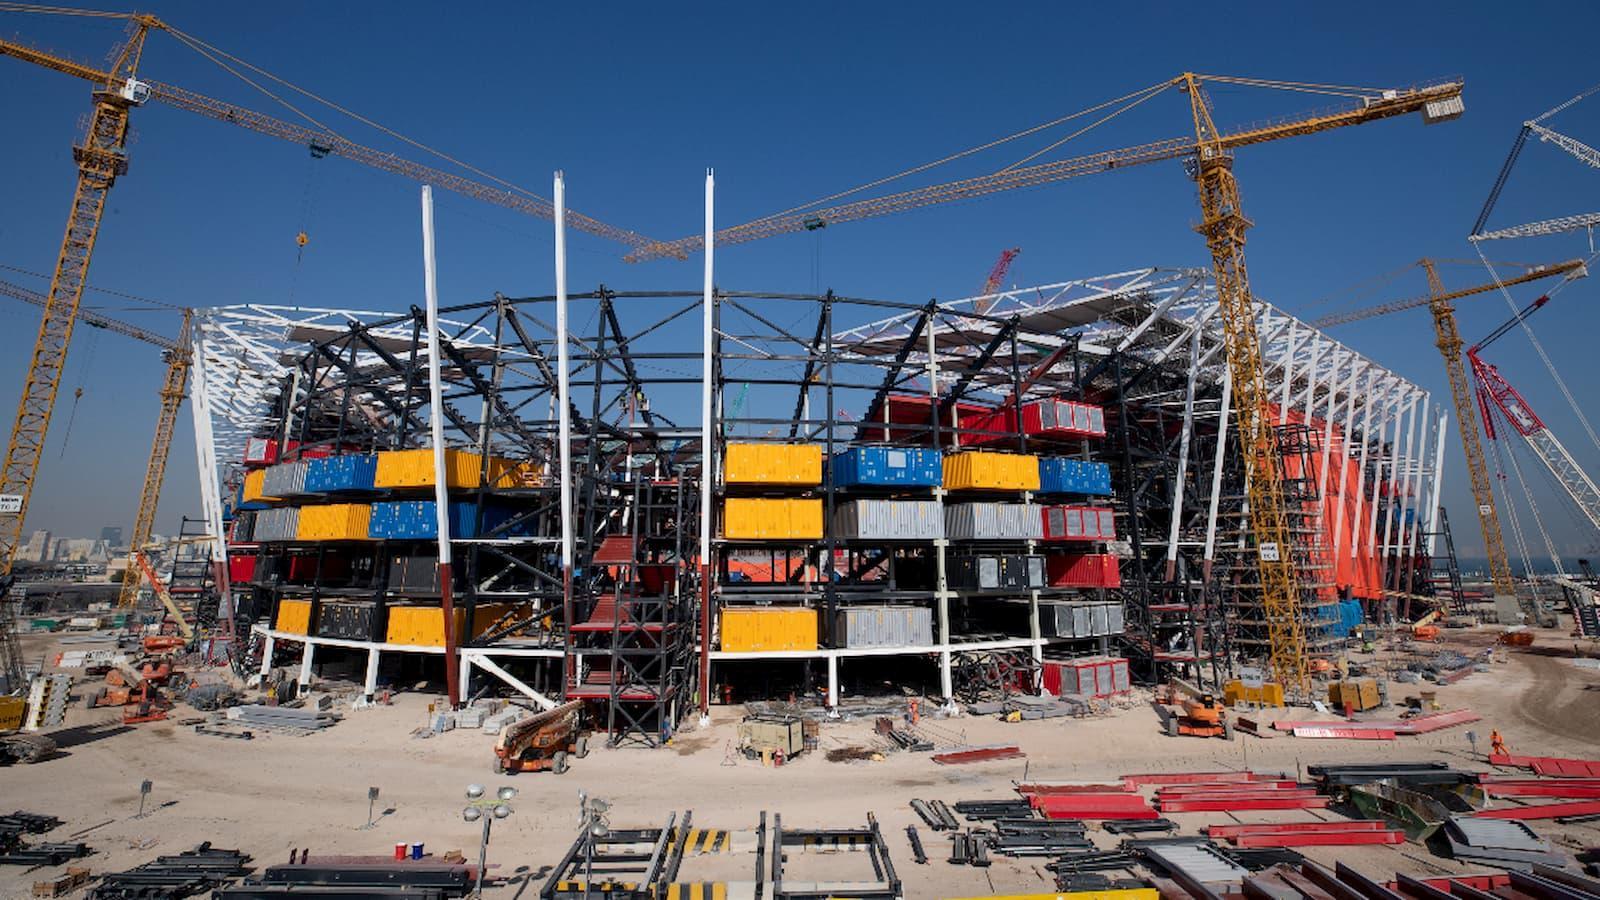 Qatar 2022 stadiums continue to take shape despite pandemic